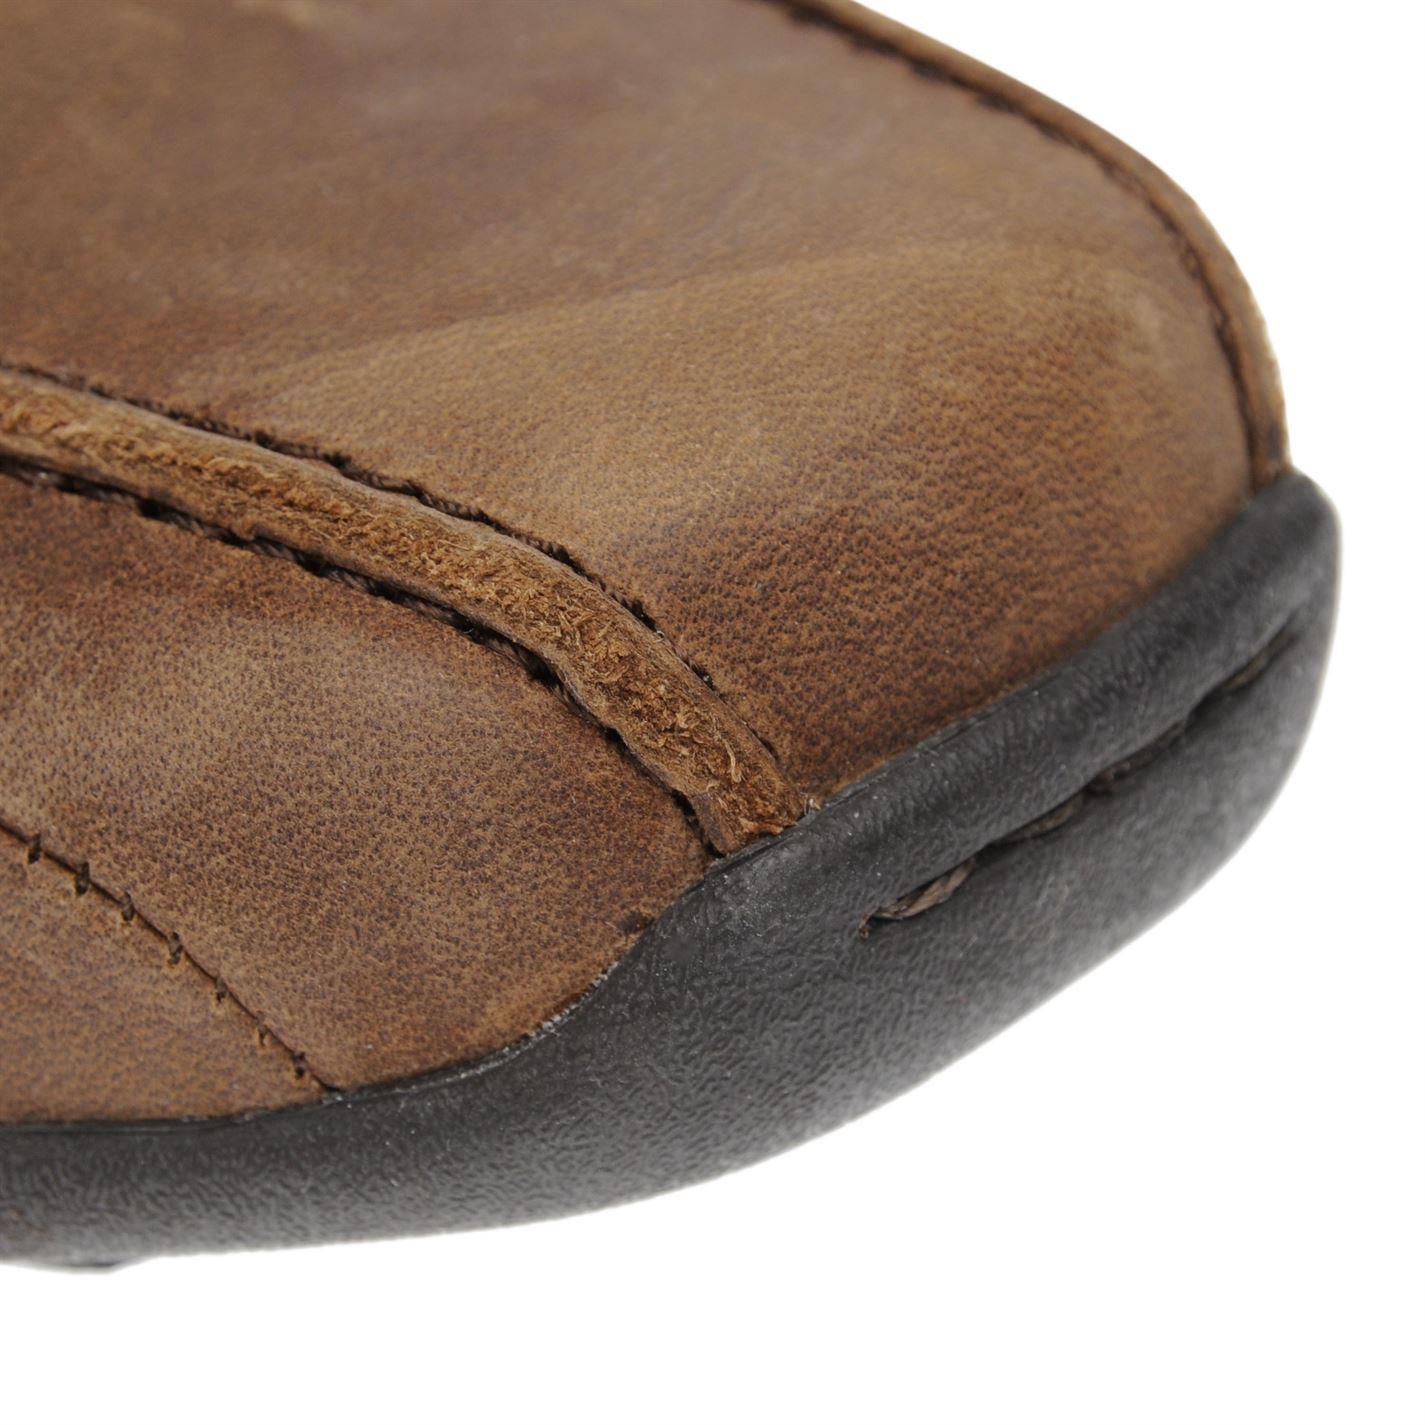 Kangol Vine Slip Mens Gents Everyday Shoes